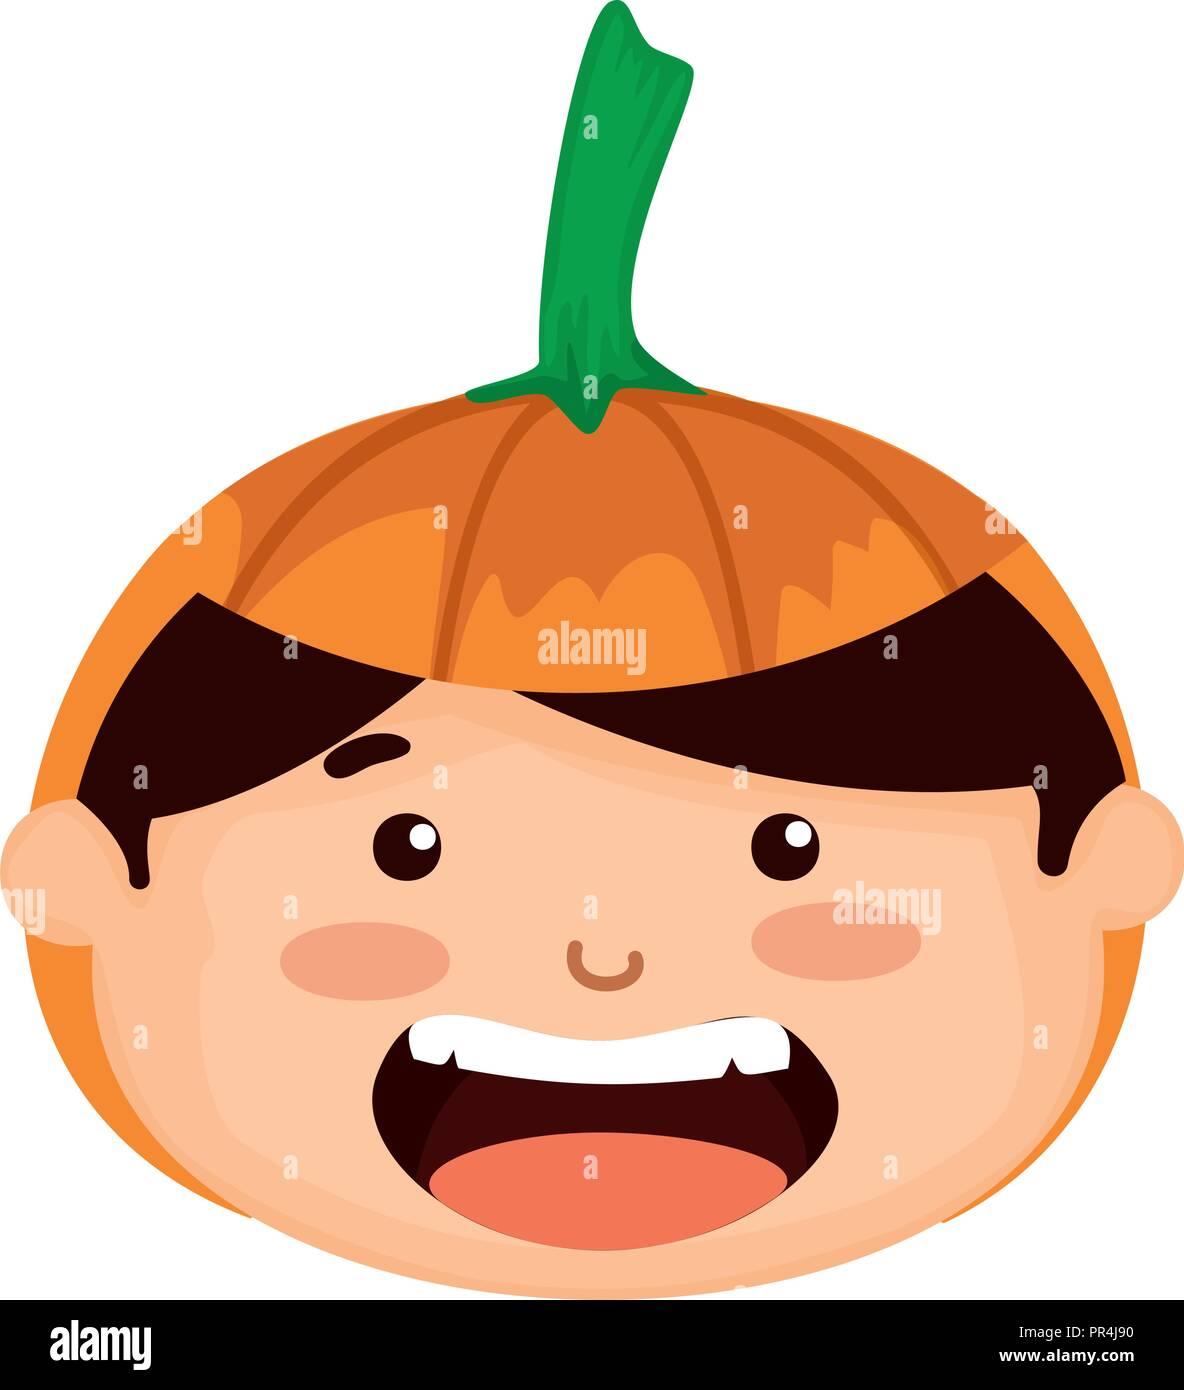 Halloween Pumpkin Vector Art.Head Boy Dressed Up As A Halloween Pumpkin Vector